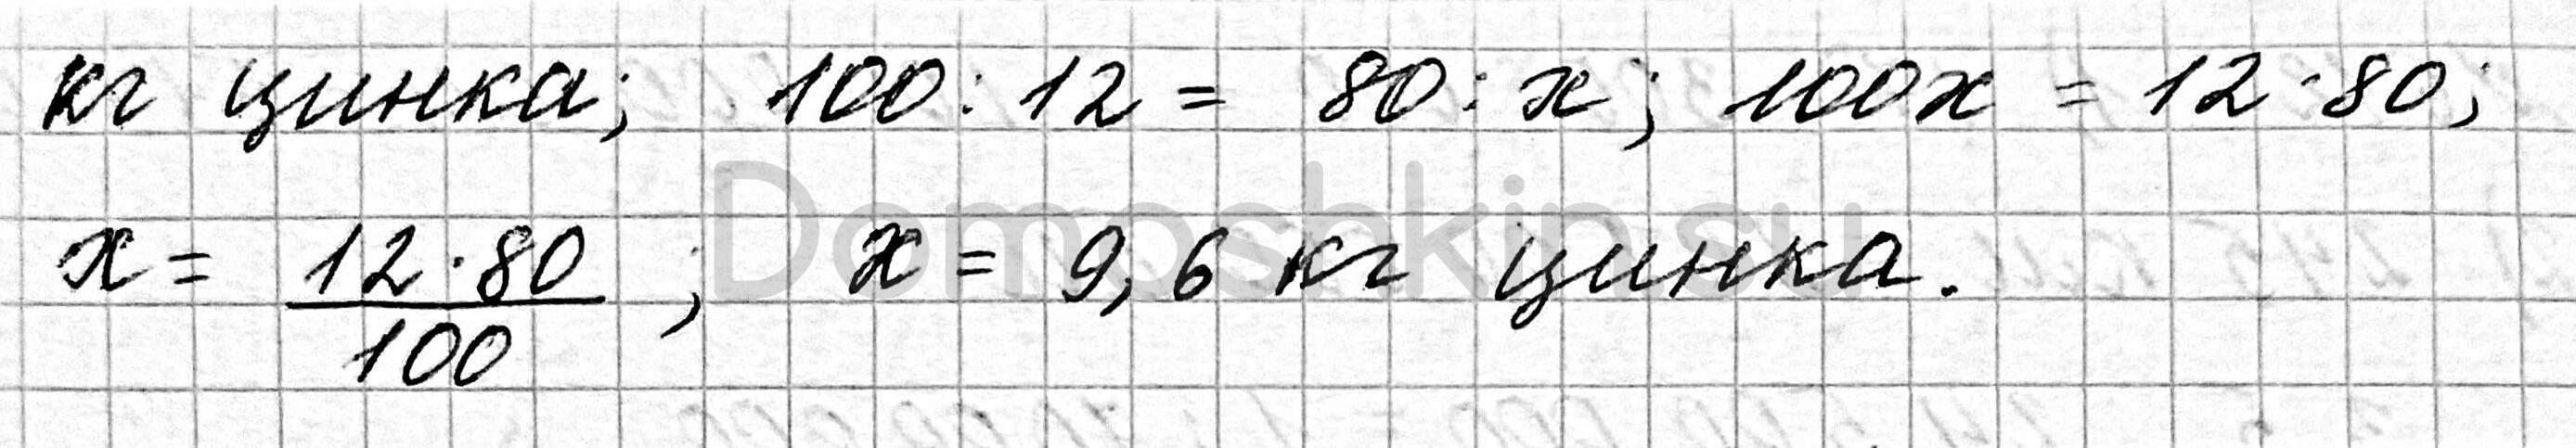 Математика 6 класс учебник Мерзляк номер 610 решение